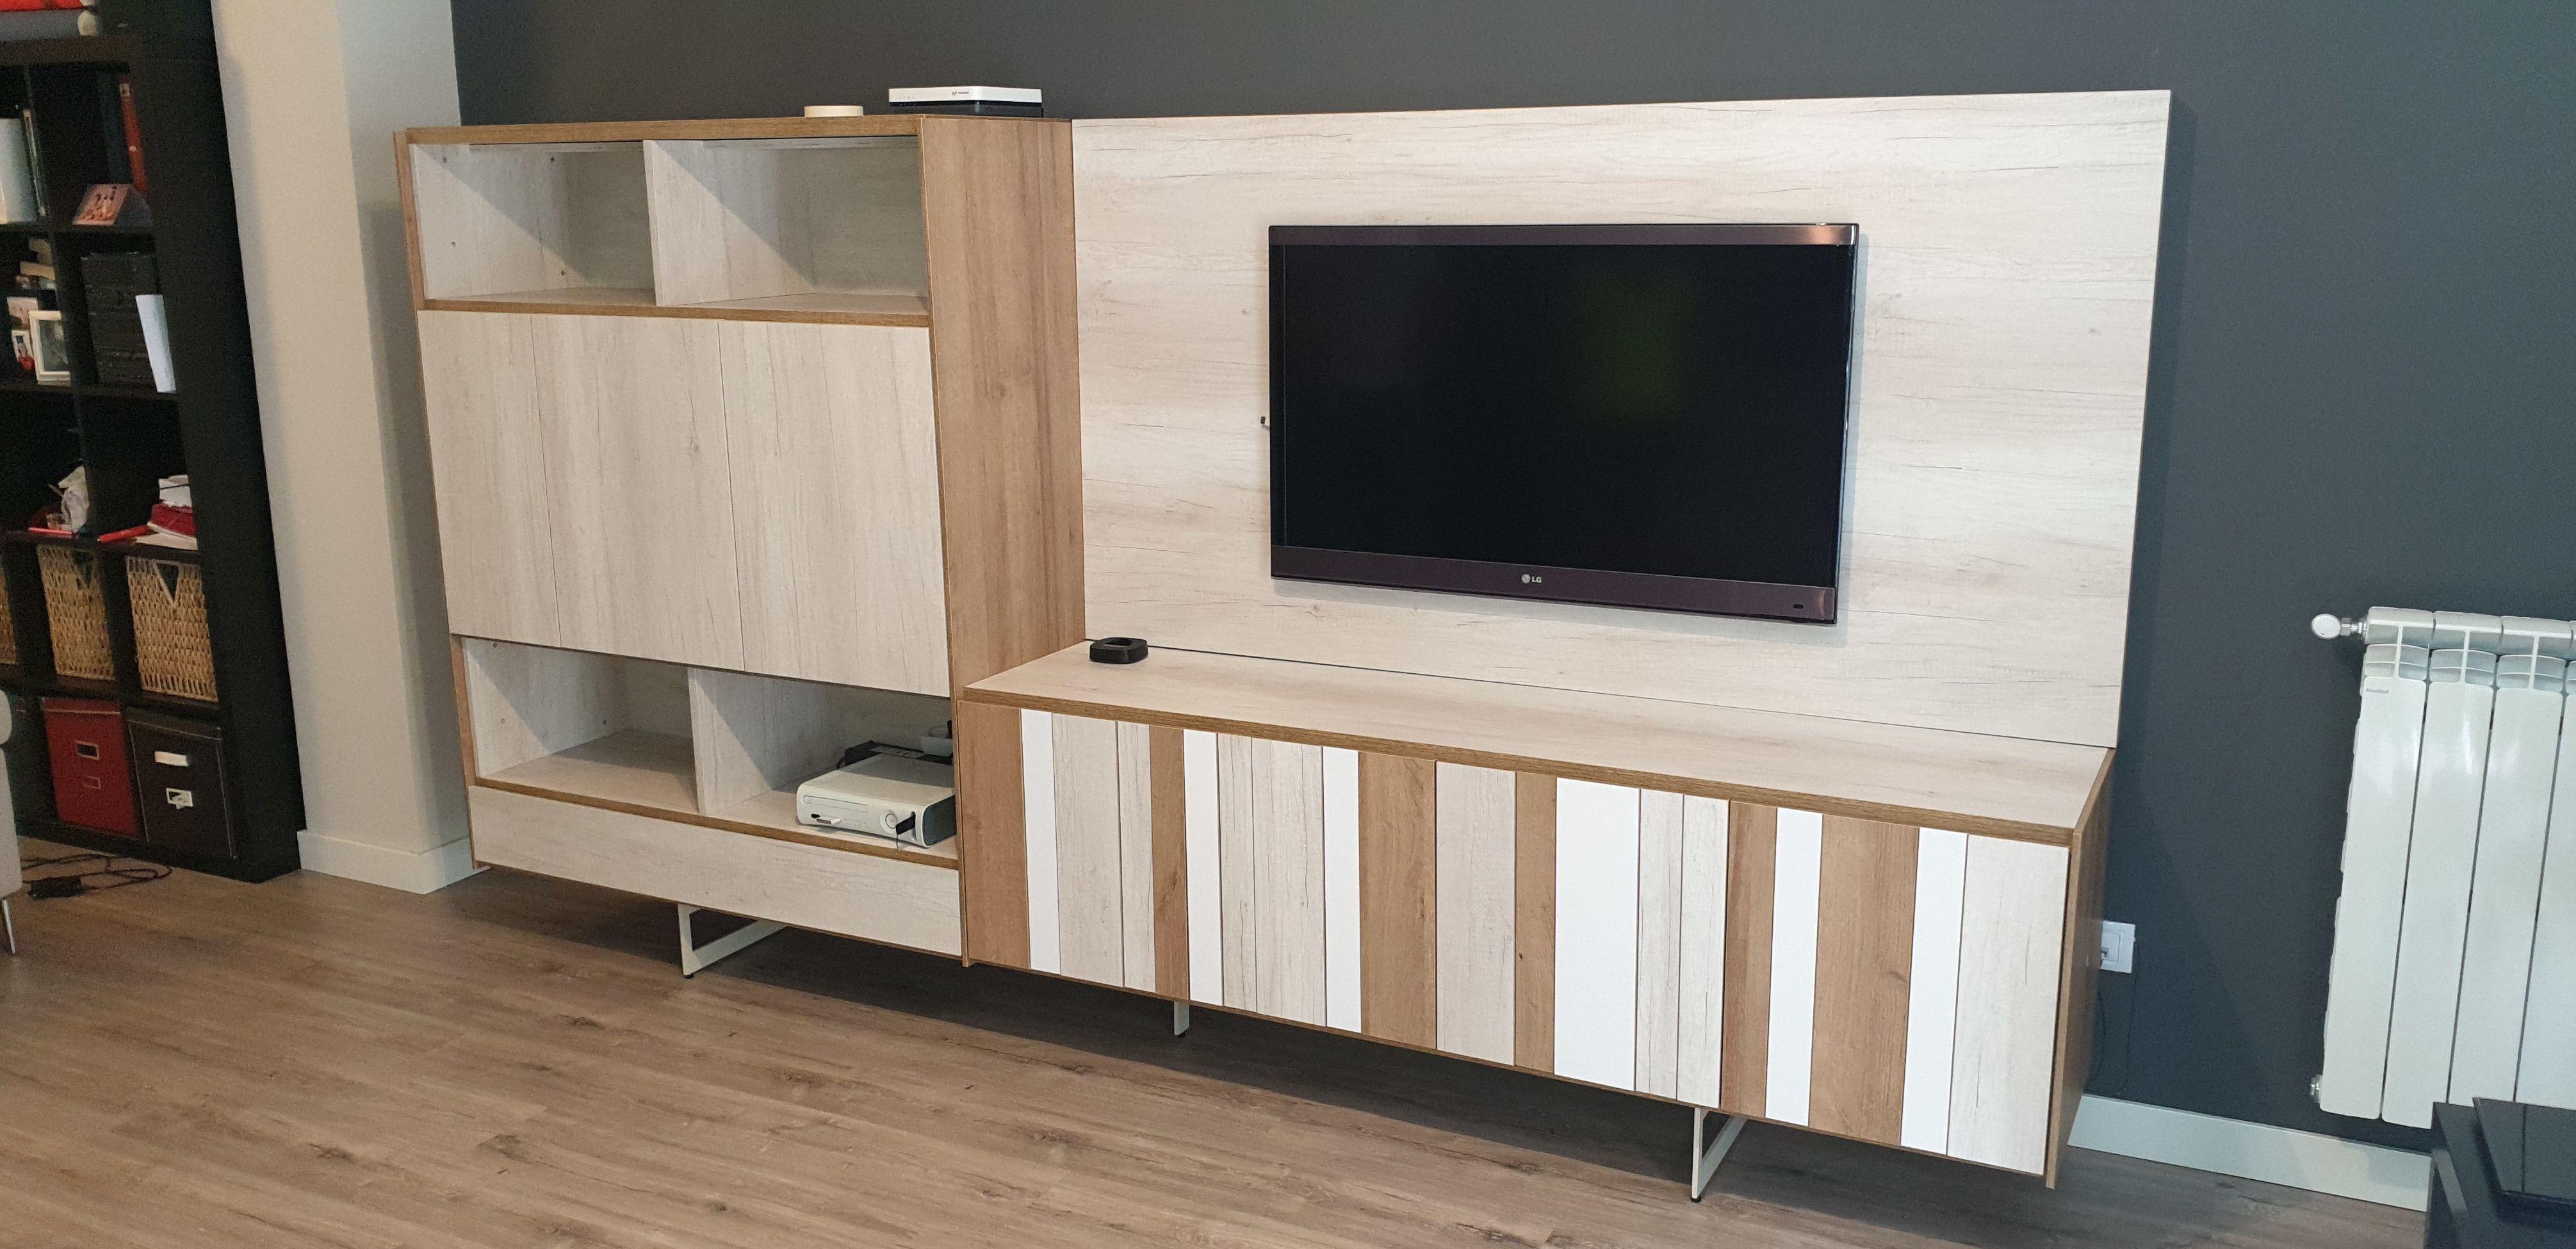 Mueble de salón con panel de tv.